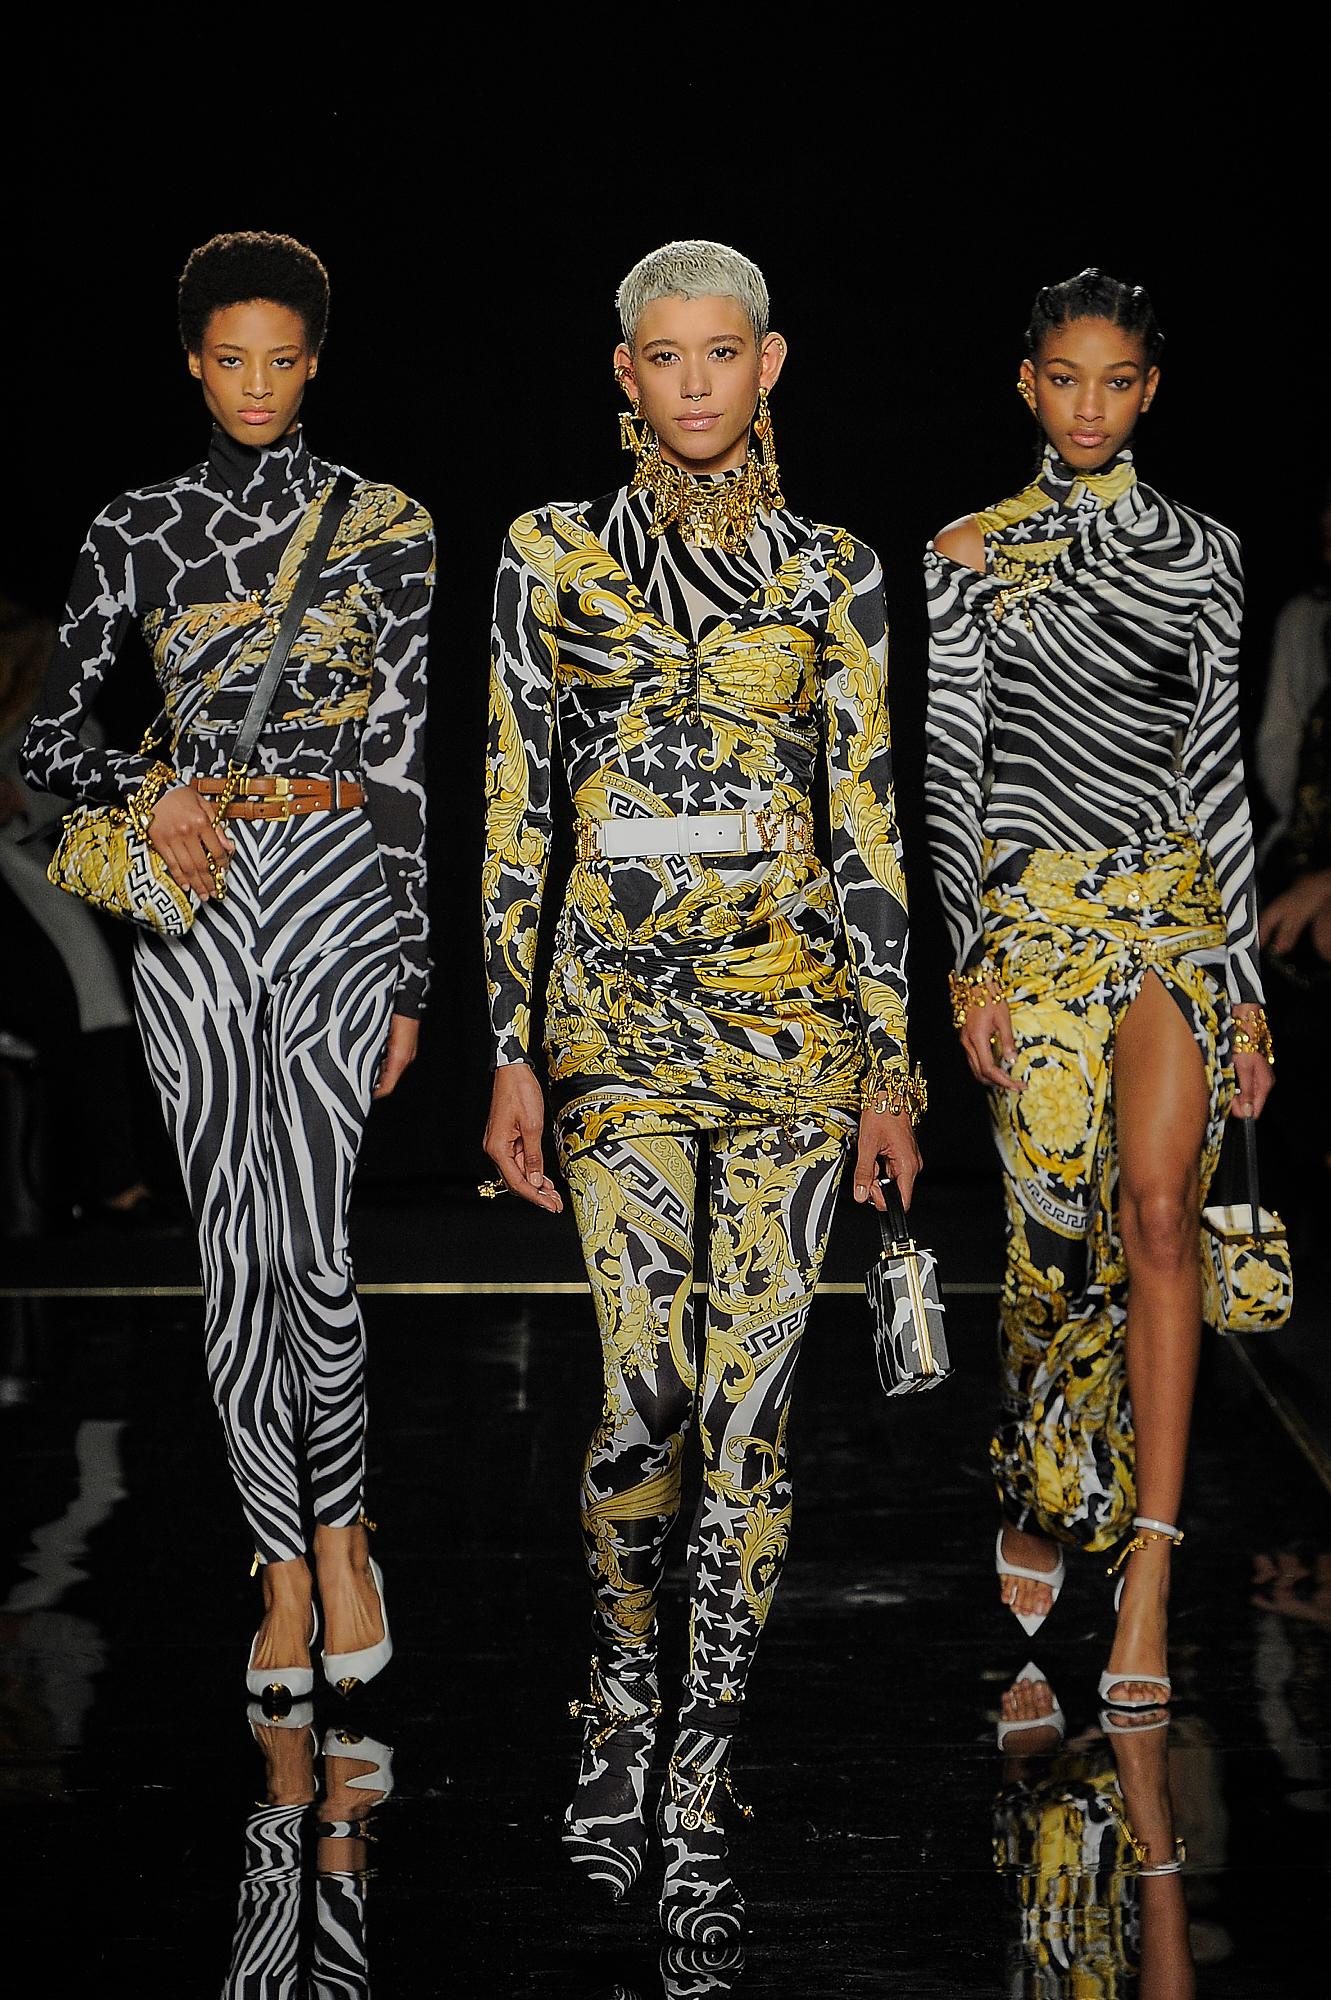 Versace_11_d9_versace_runway_runway_00011.jpg